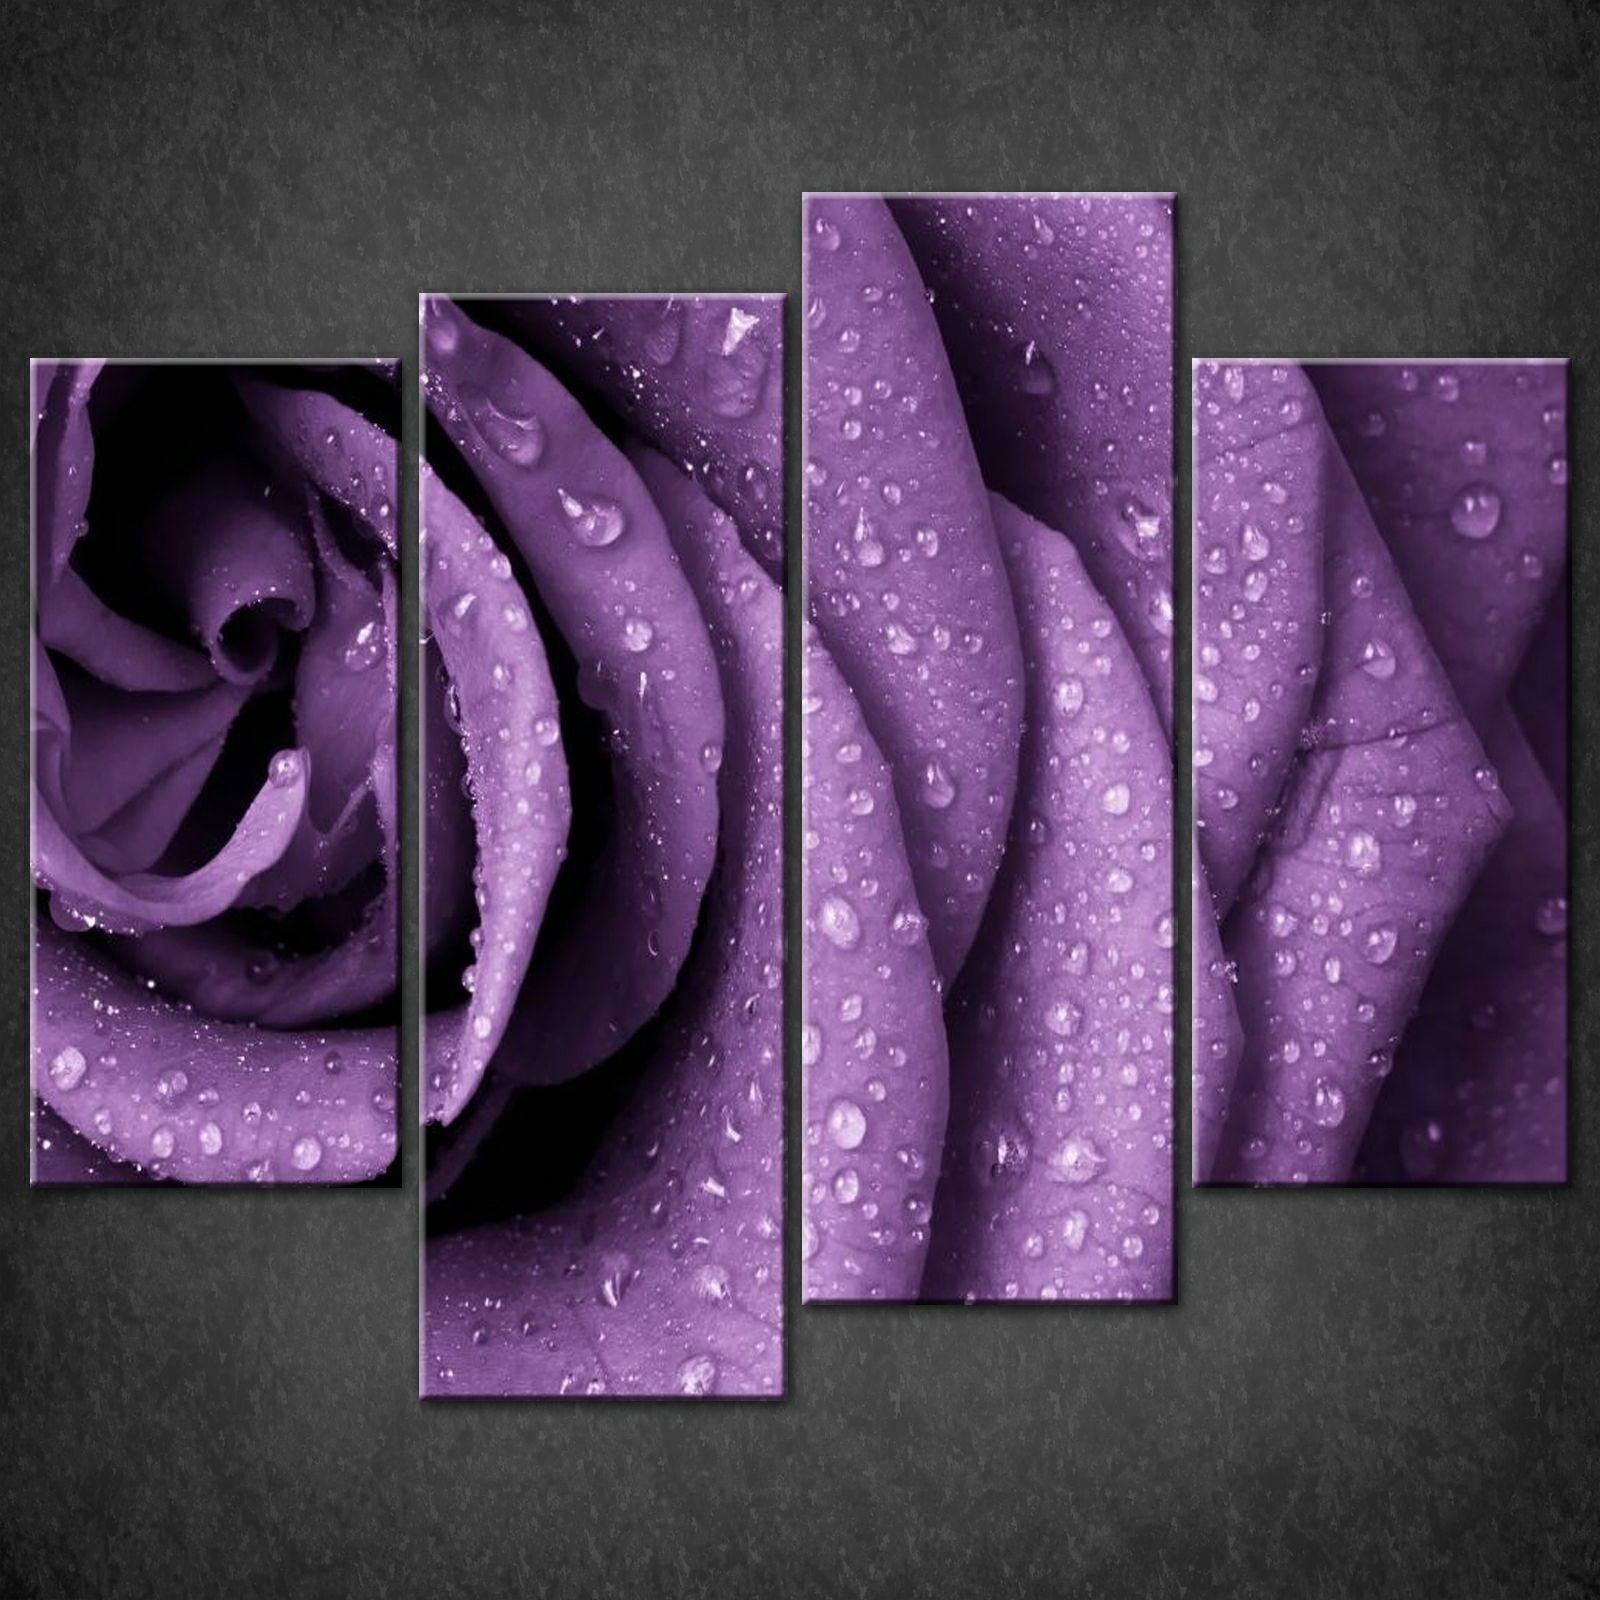 Wall Art Designs: Top Purple Canvas Wall Art Uk Wall Decor Purple Within 2018 Purple Wall Art Canvas (View 20 of 20)